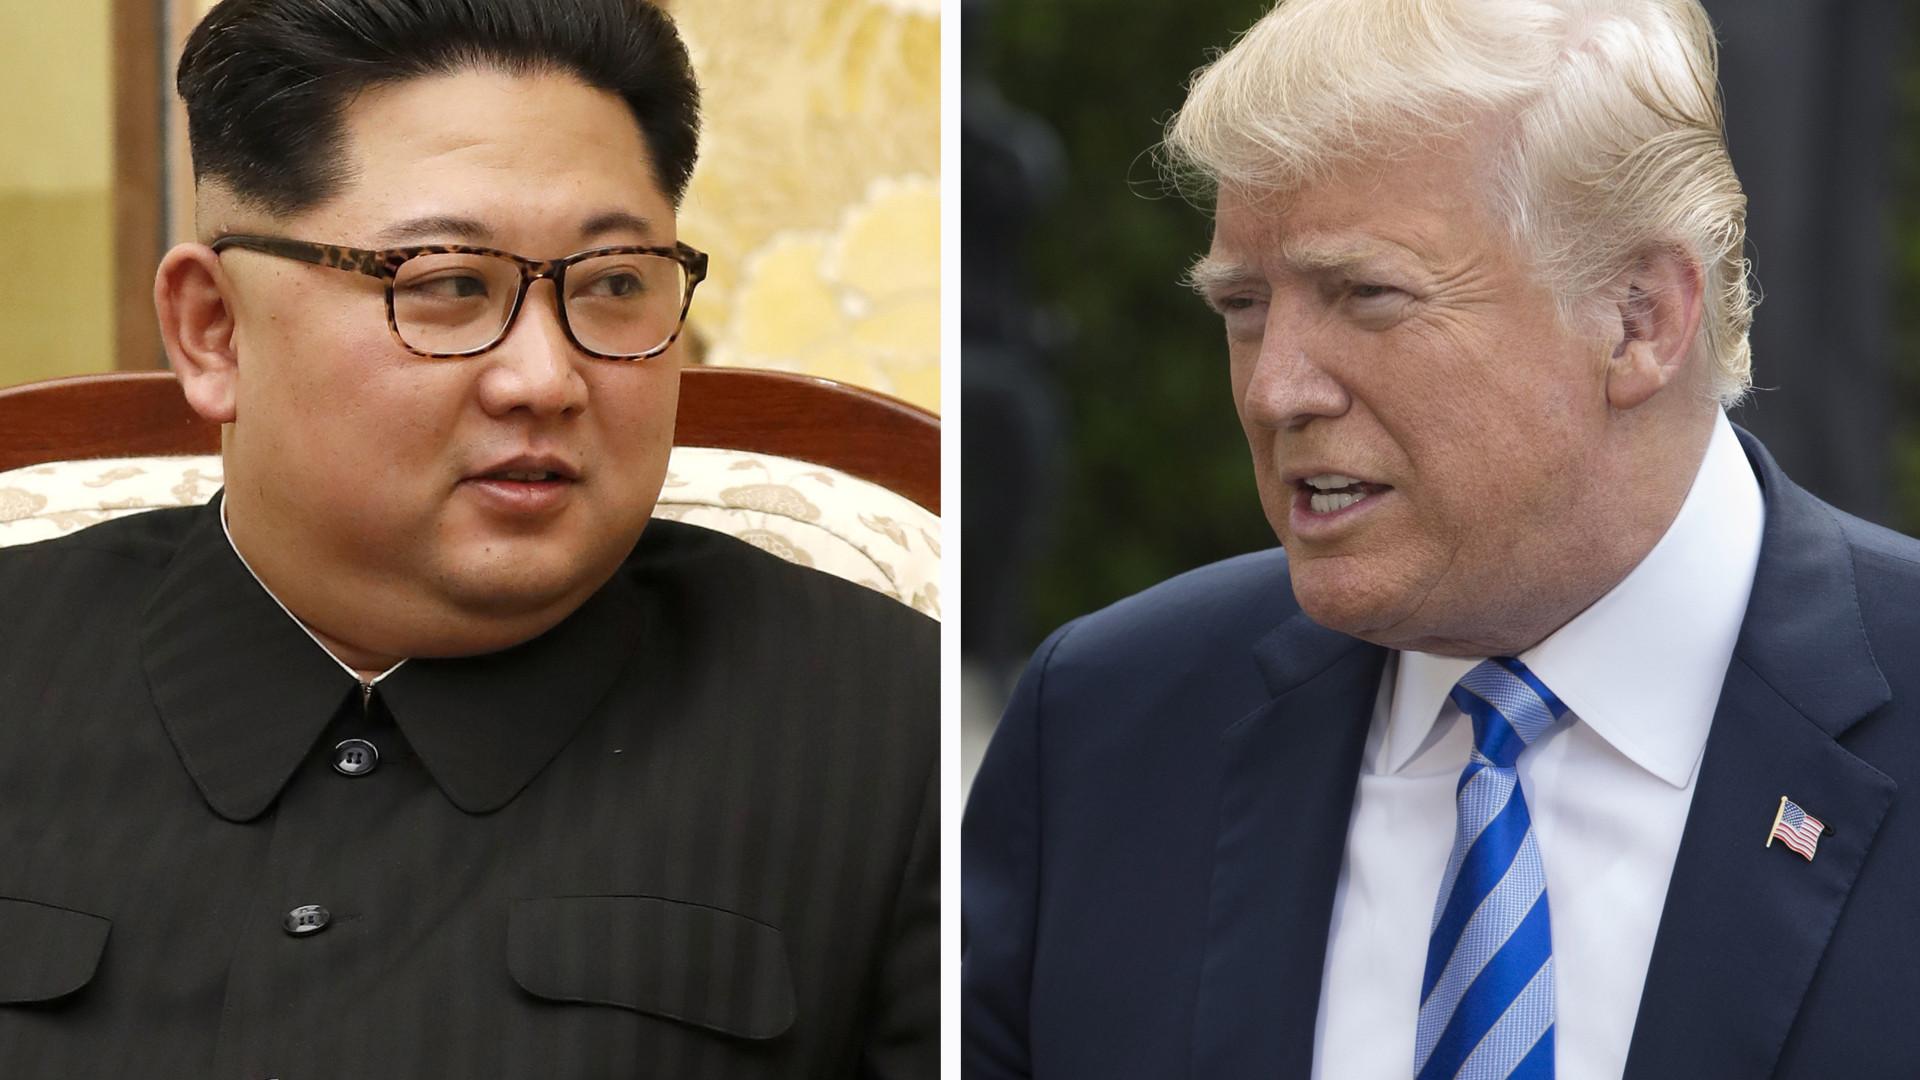 Coreia do Norte critica vice-Presidente dos EUA e lança dúvidas